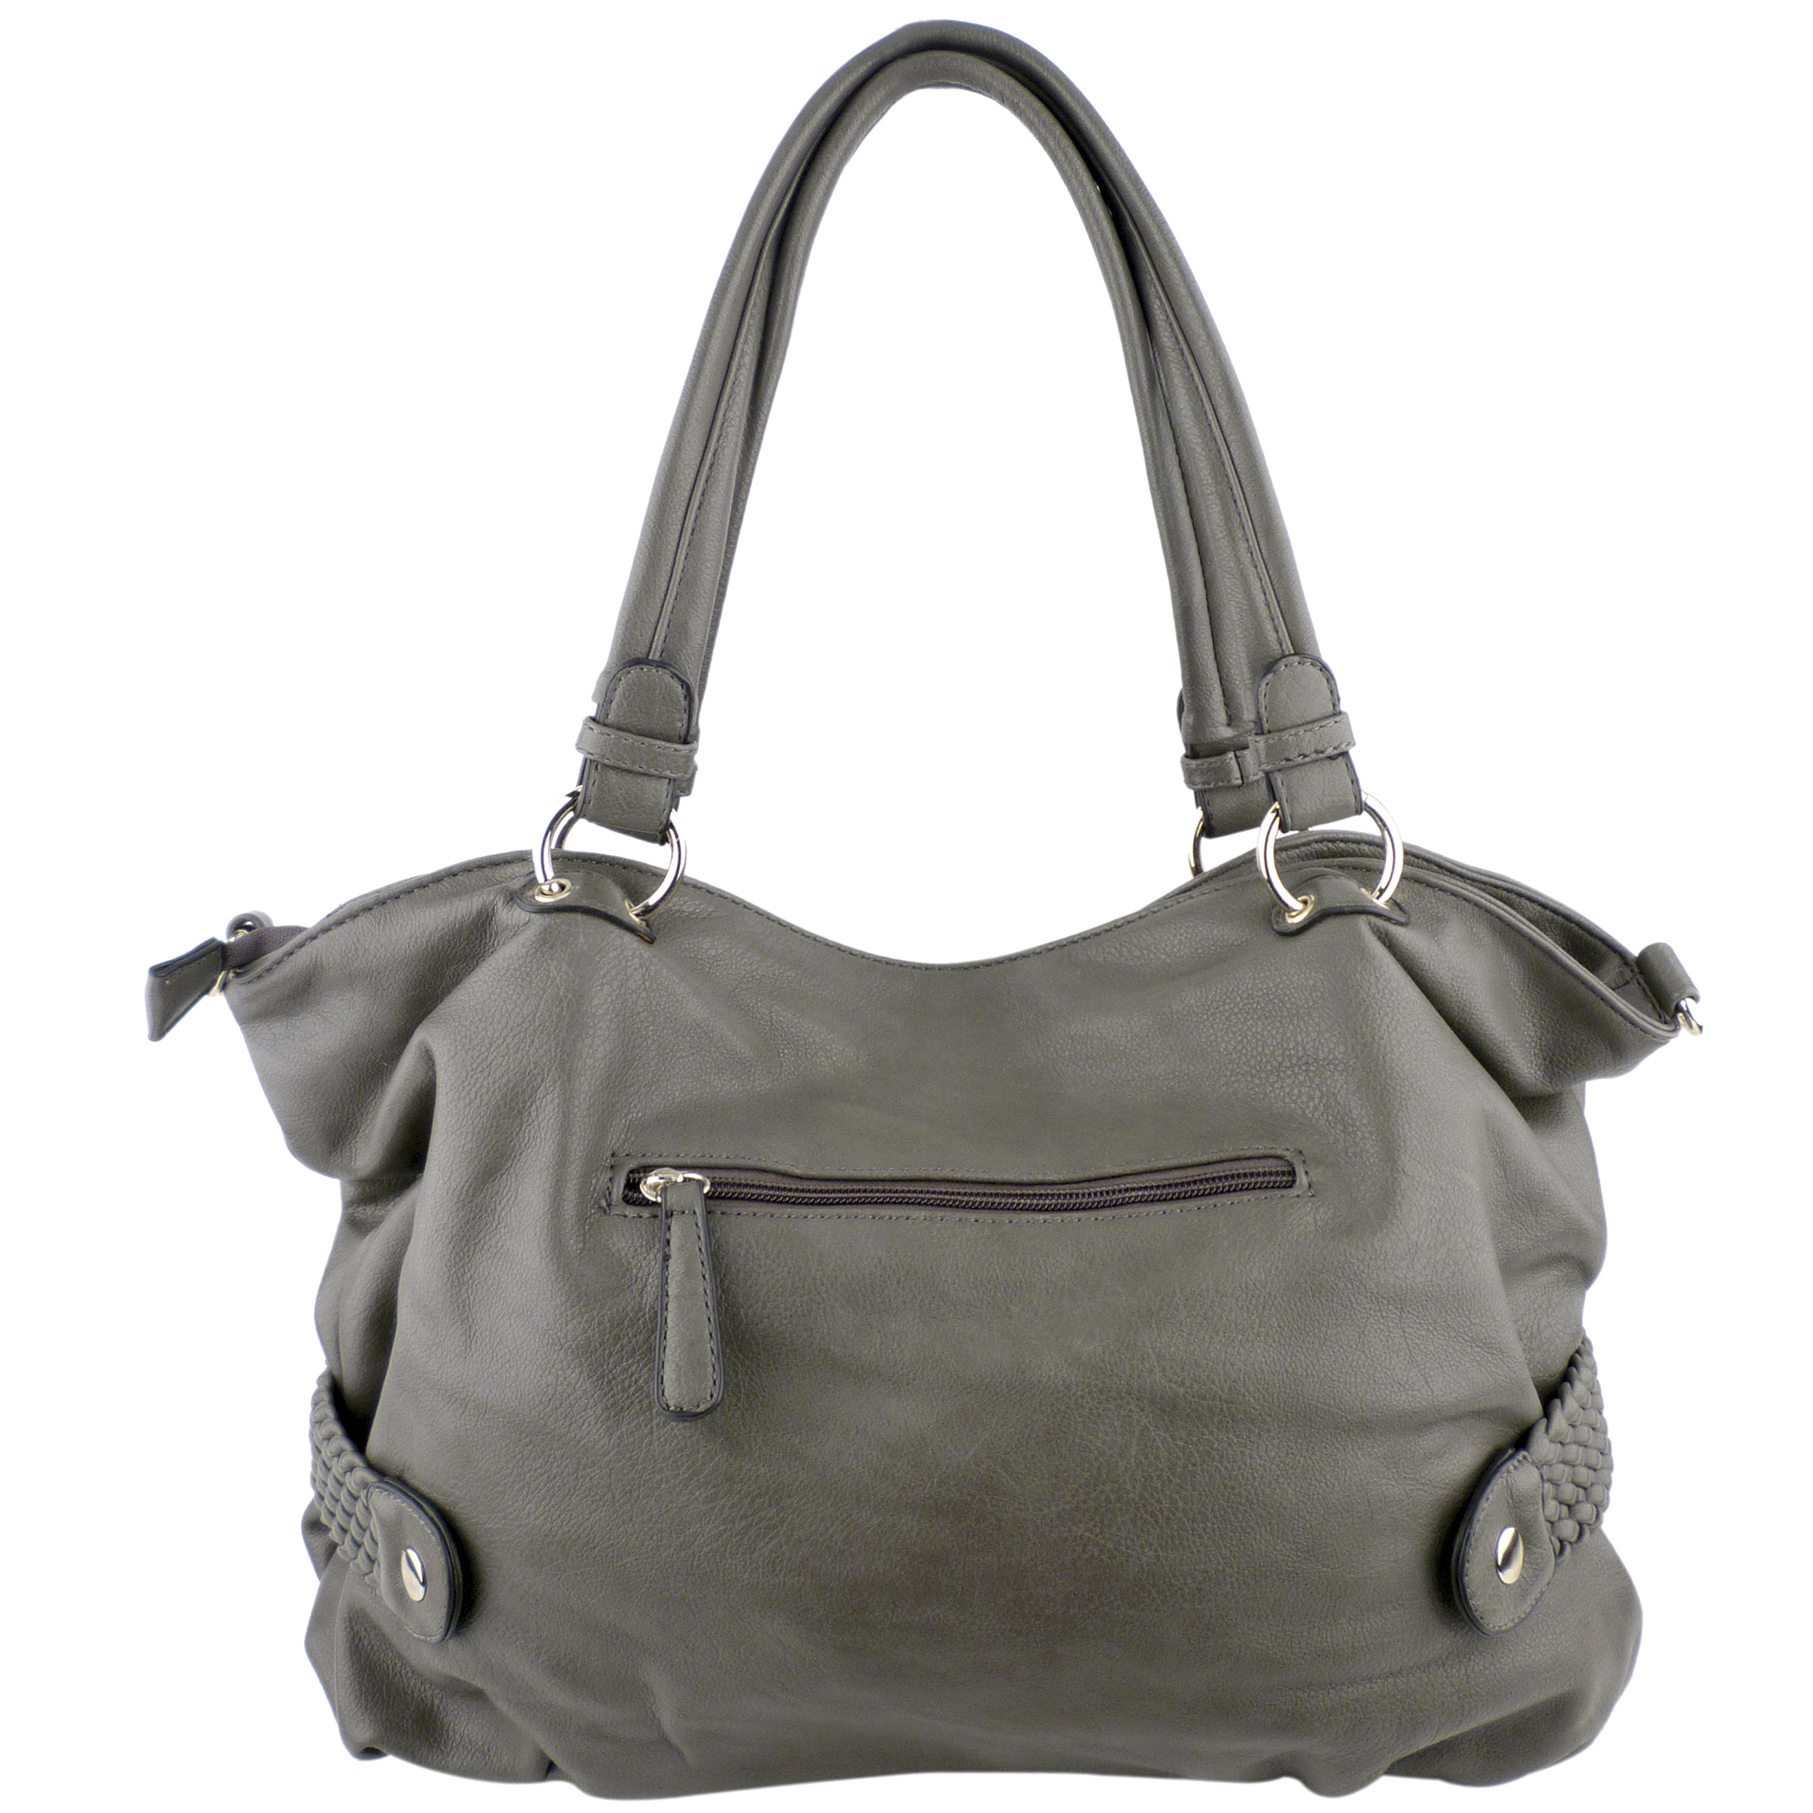 SAMANTHA Dark Grey Weave Pattern Soft Hobo Handbag back